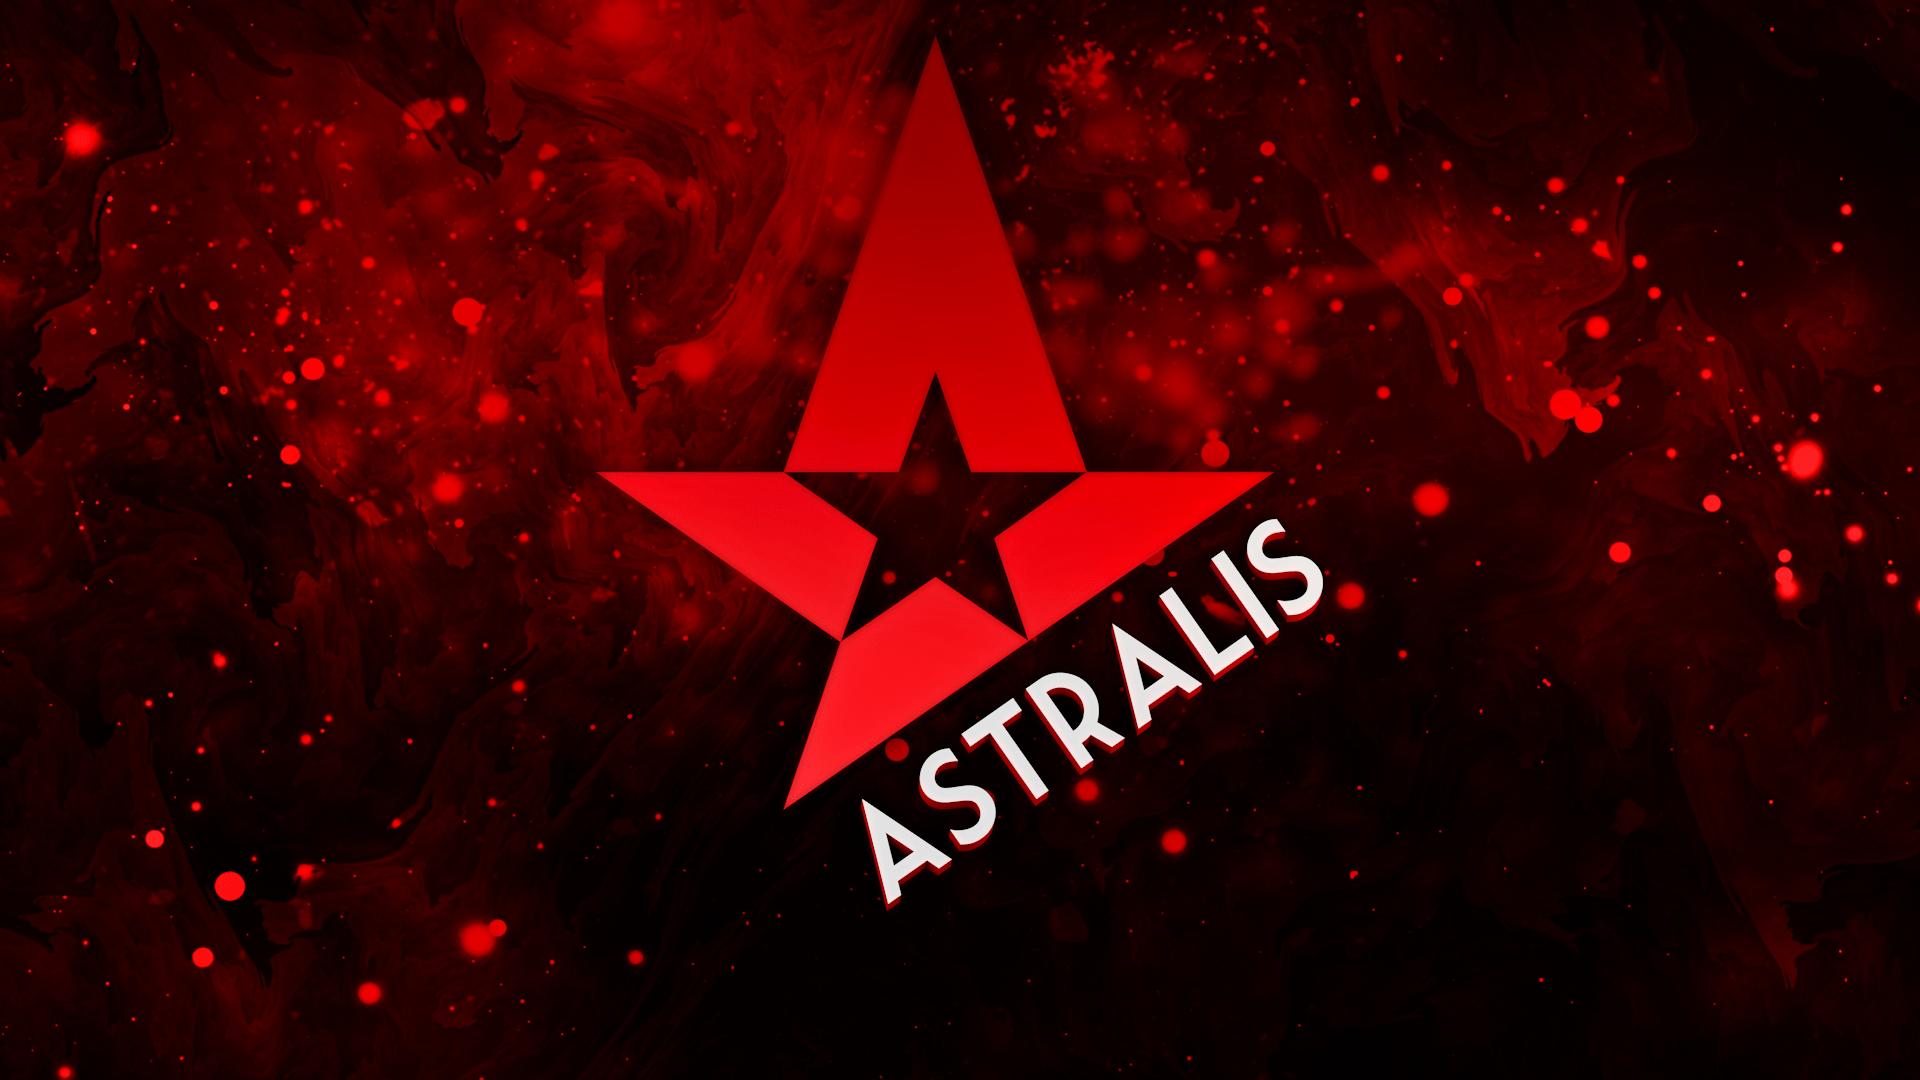 Astralis выпустила песню To The Stars